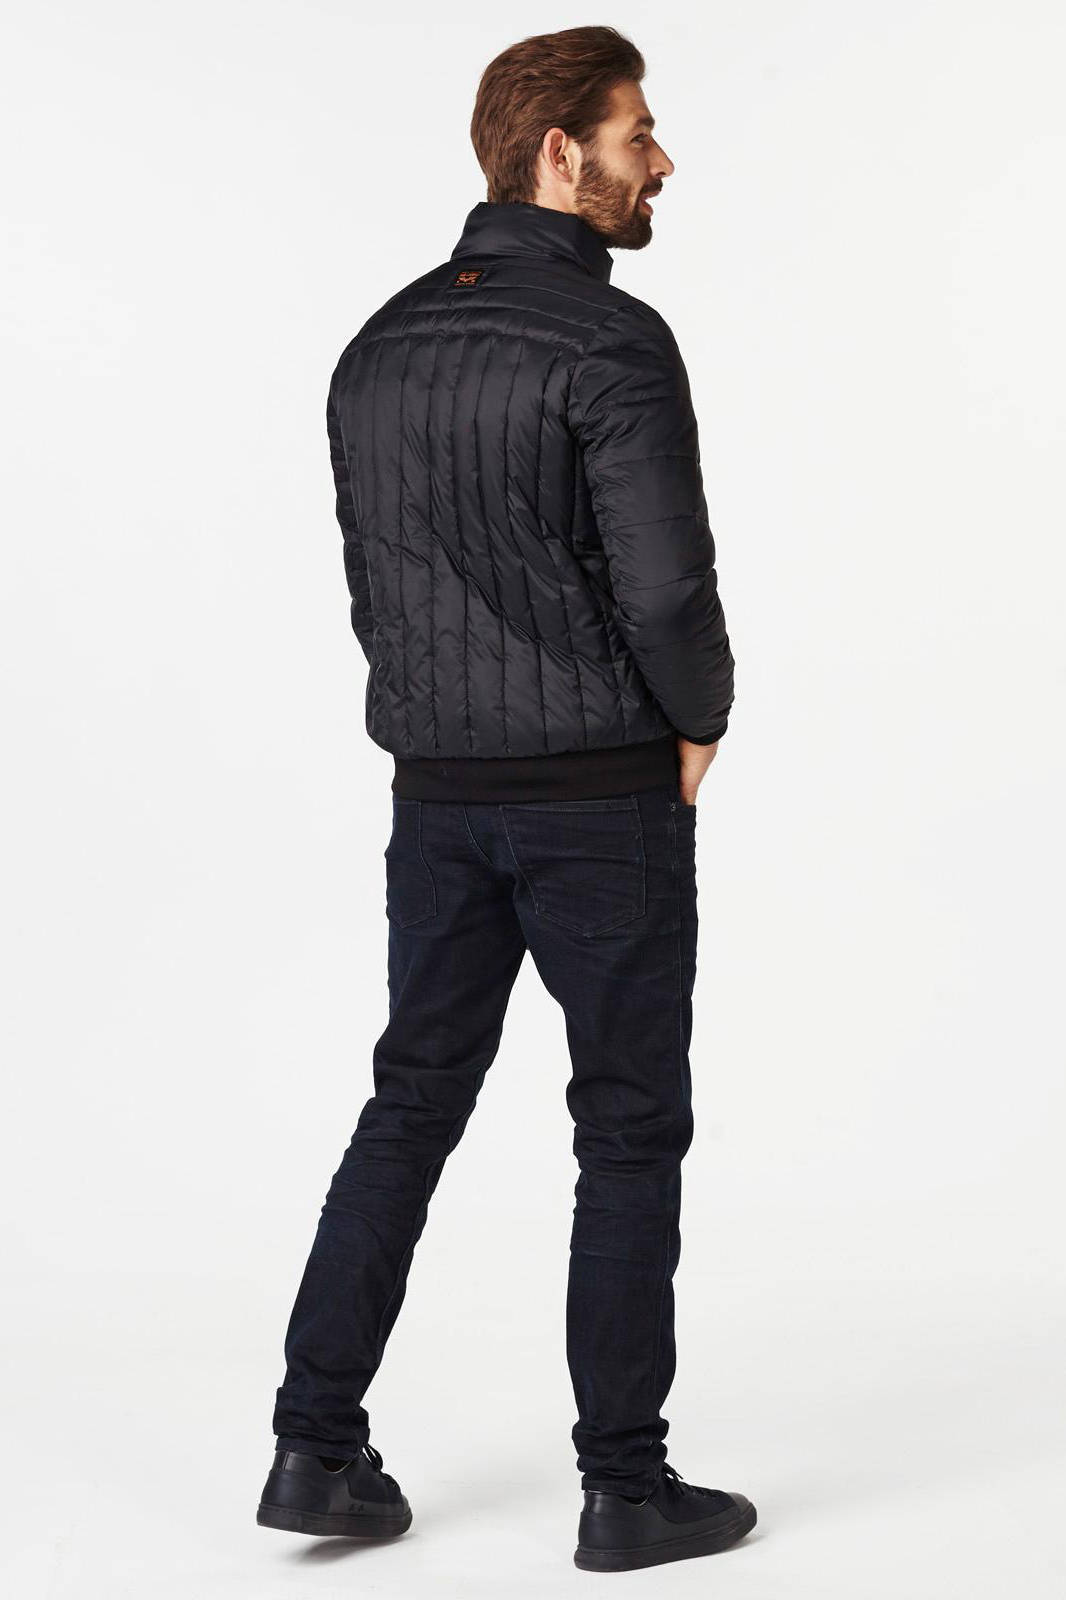 PME Legend Flight jacket spartan black Winter Jassen Zwart